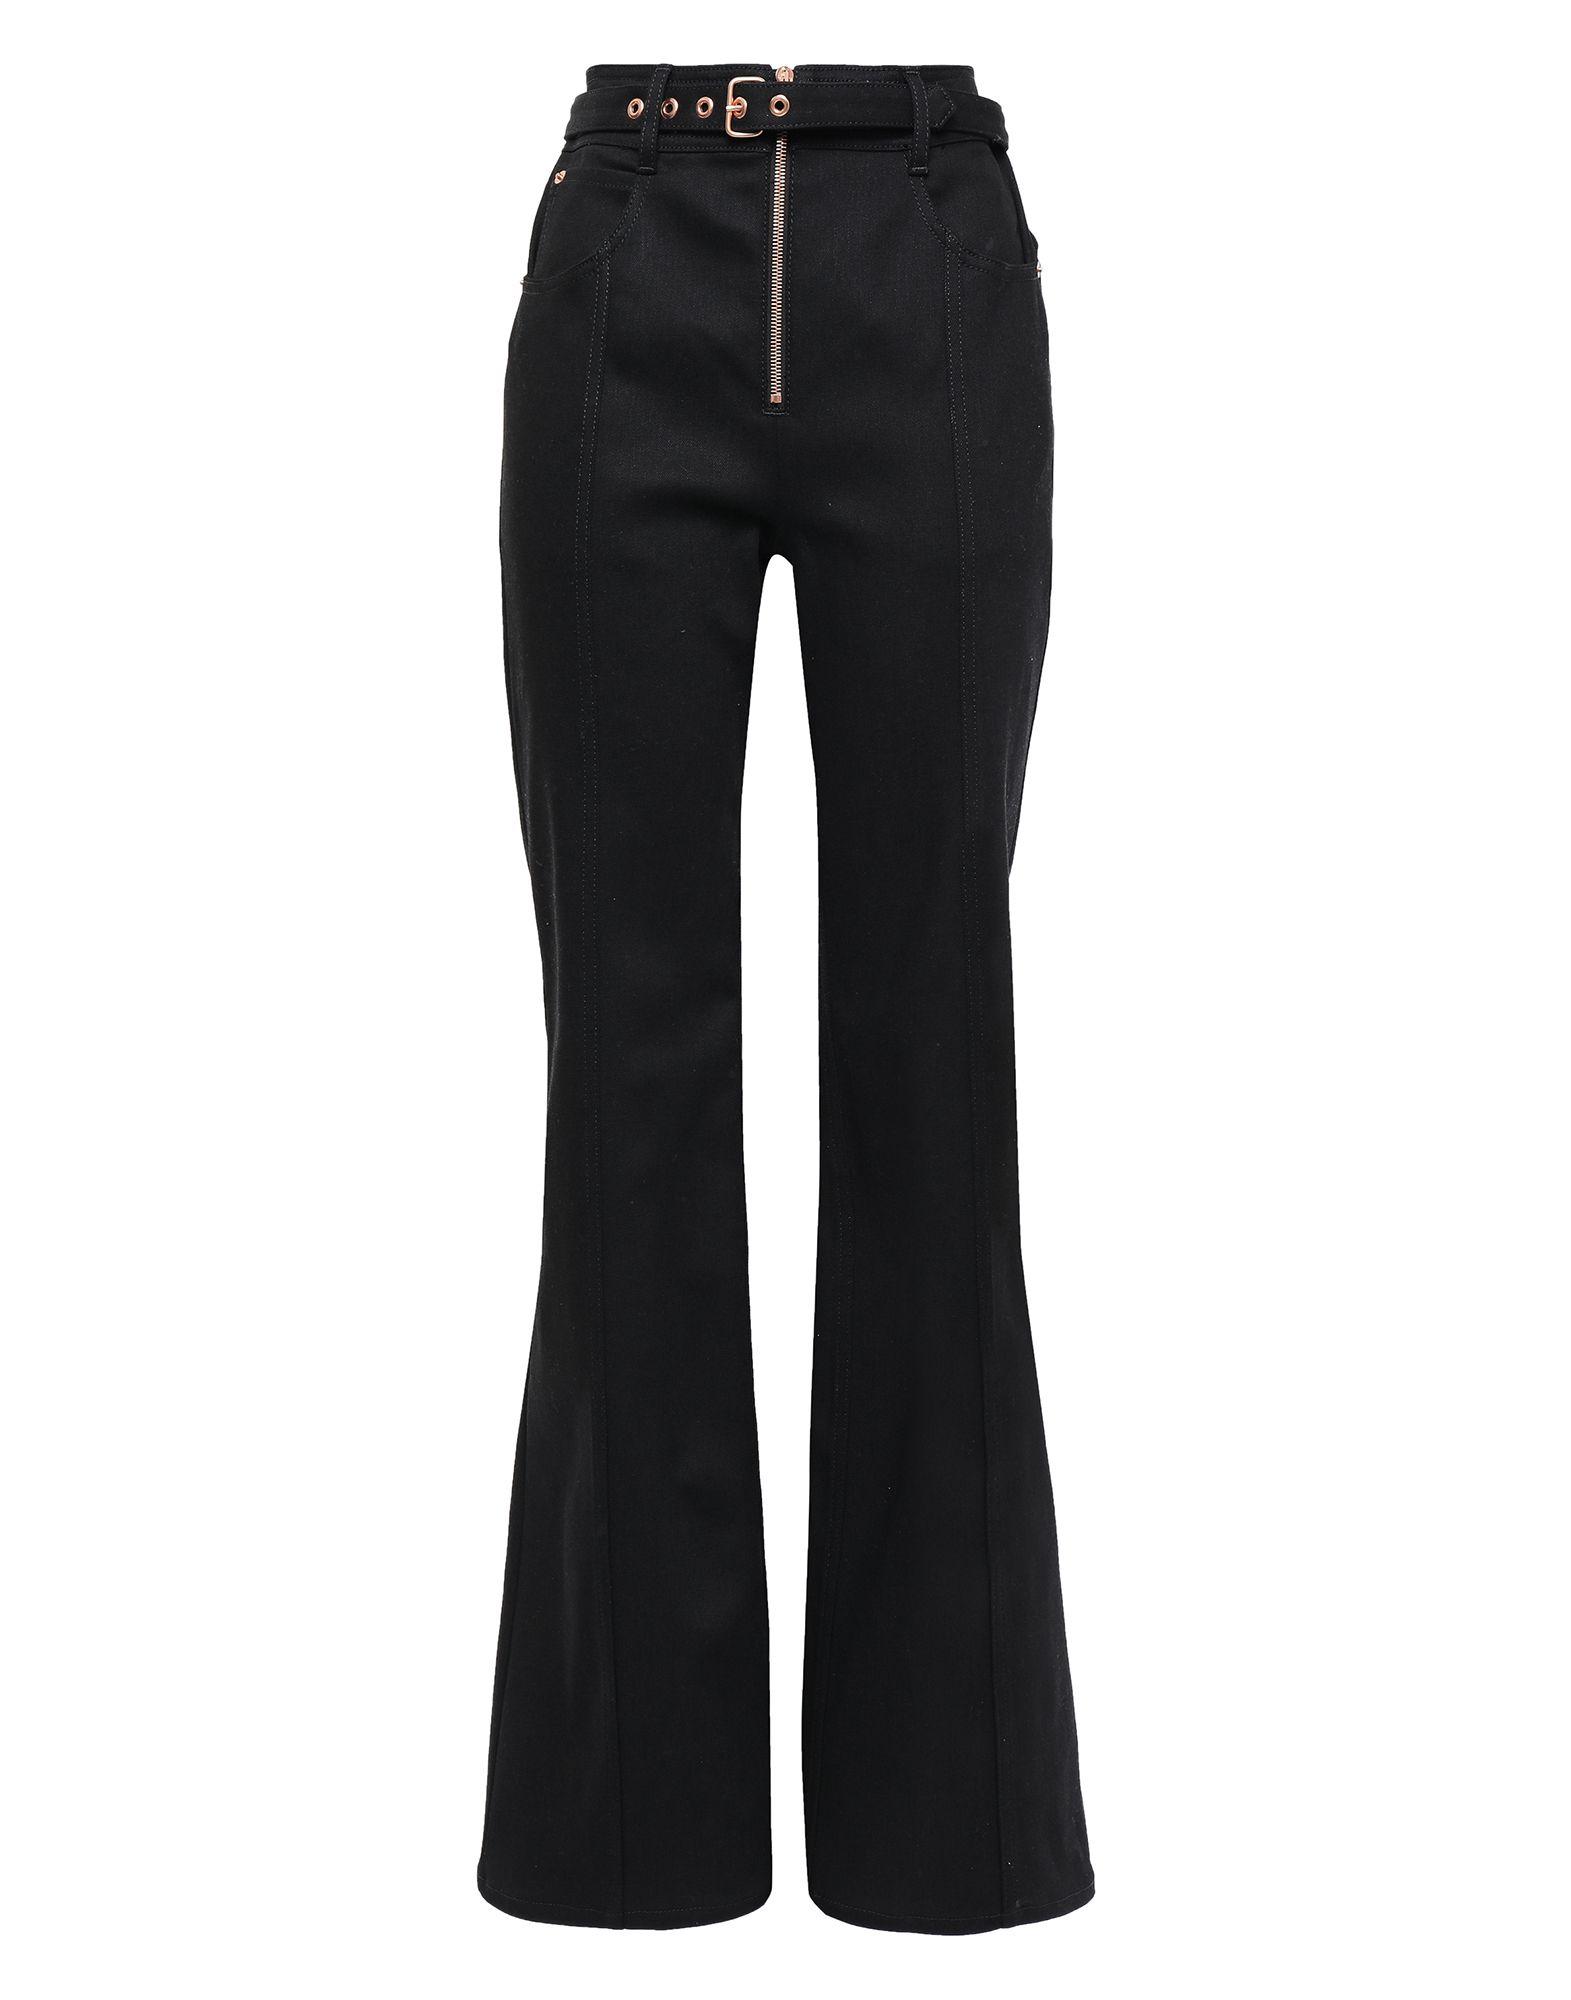 PROENZA SCHOULER Denim pants - Item 42812967